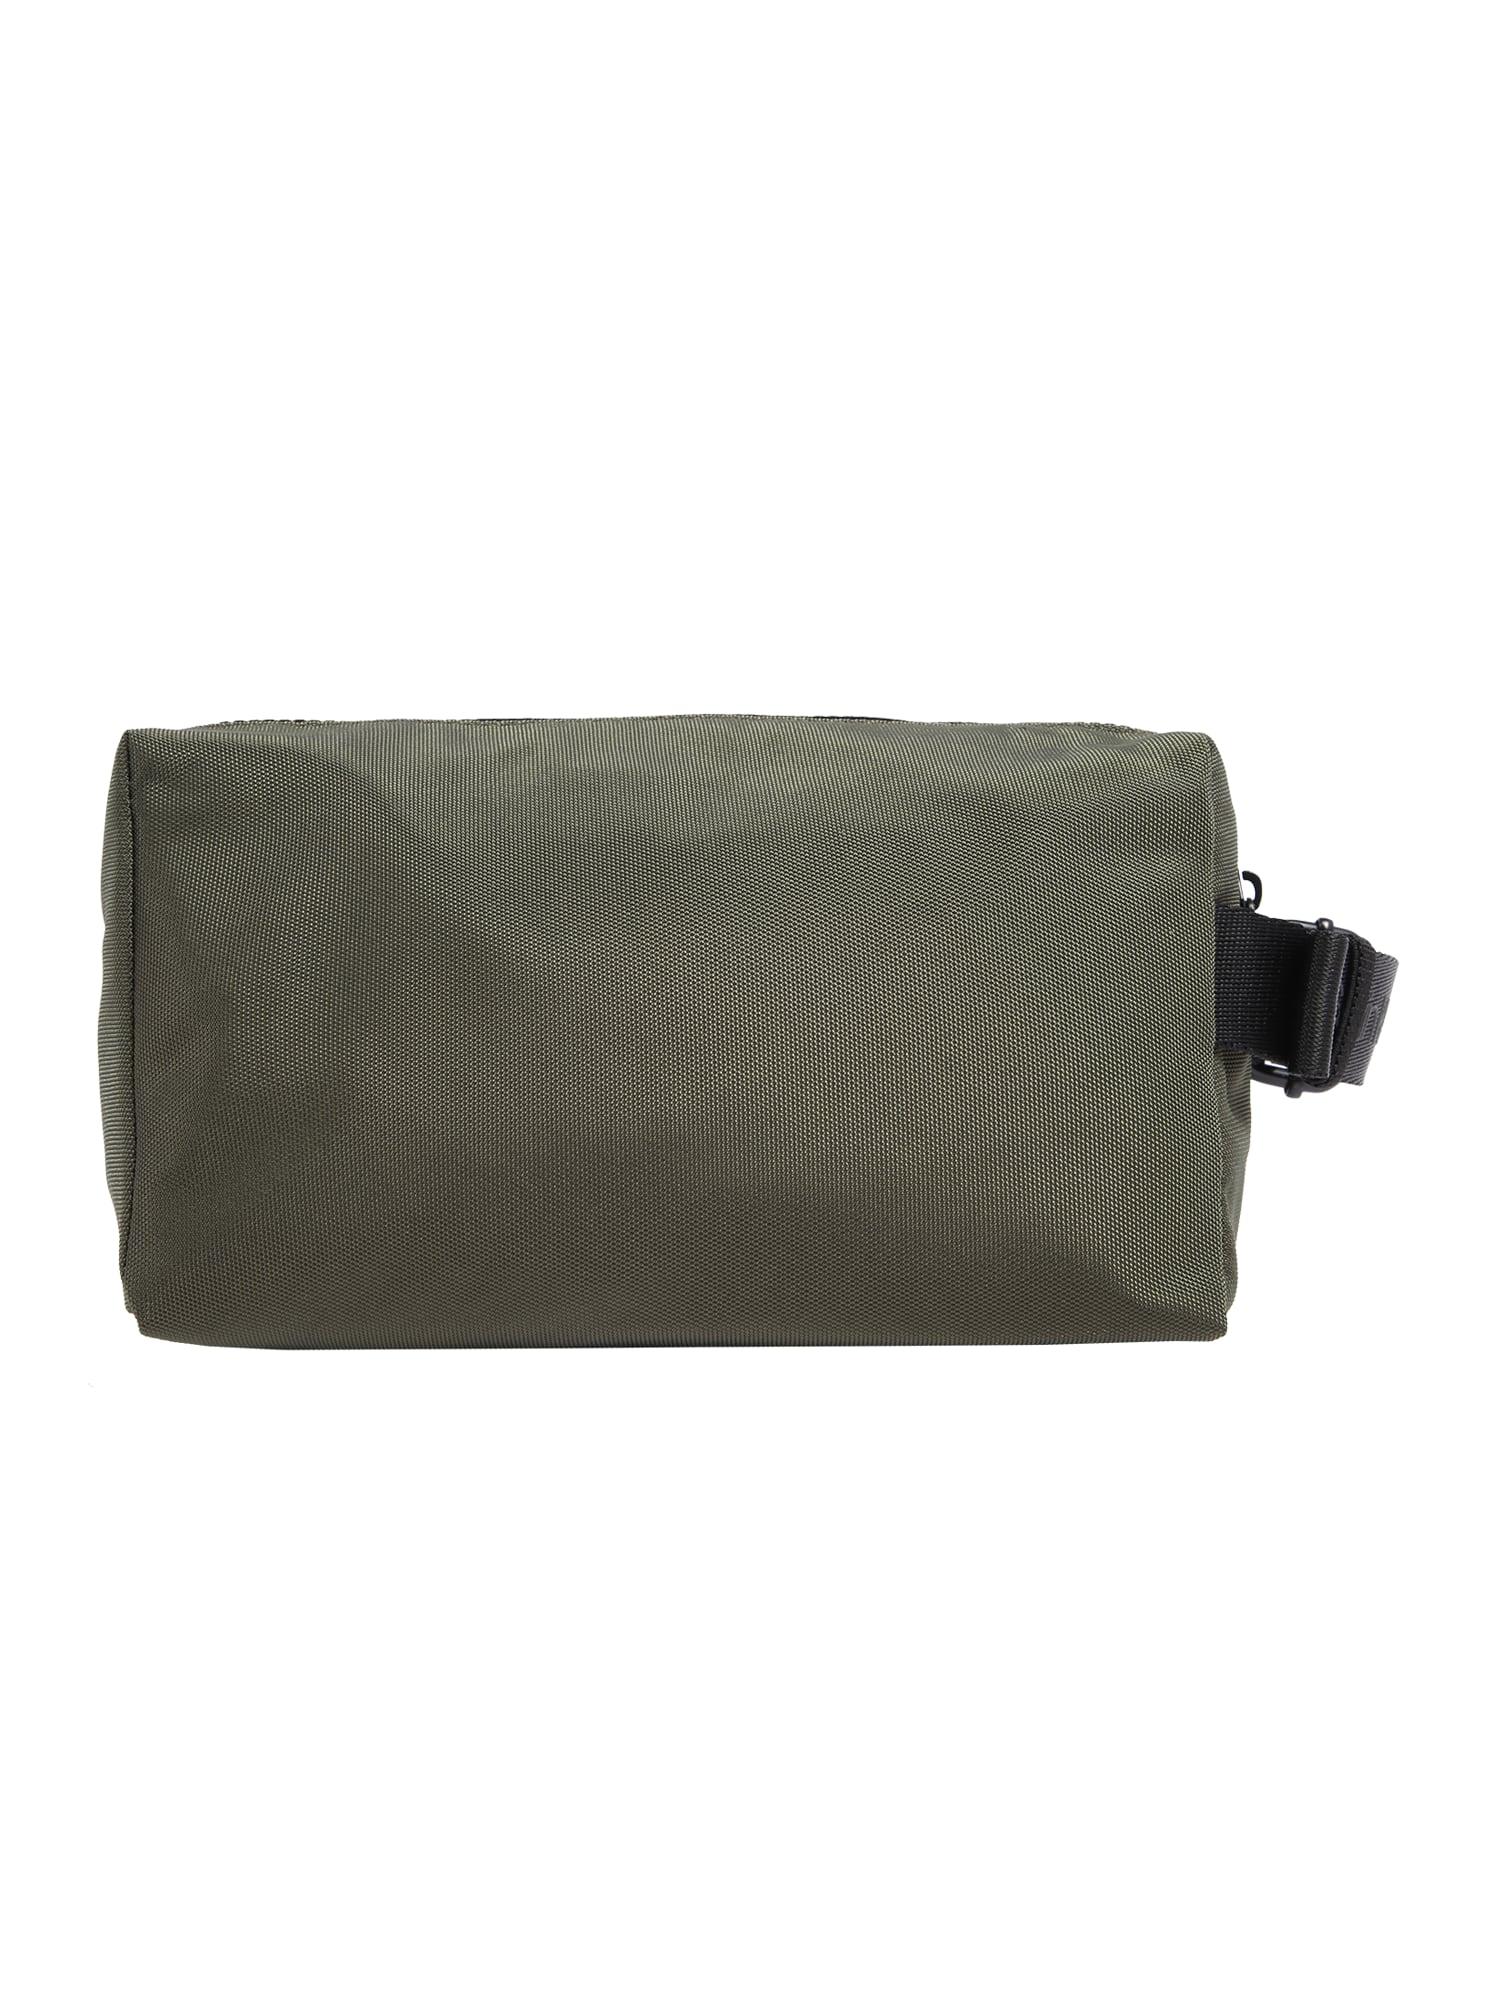 Calvin Klein Tualeto reikmenų / kosmetikos krepšys 'NASTRO LOGO WASHBAG' alyvuogių spalva